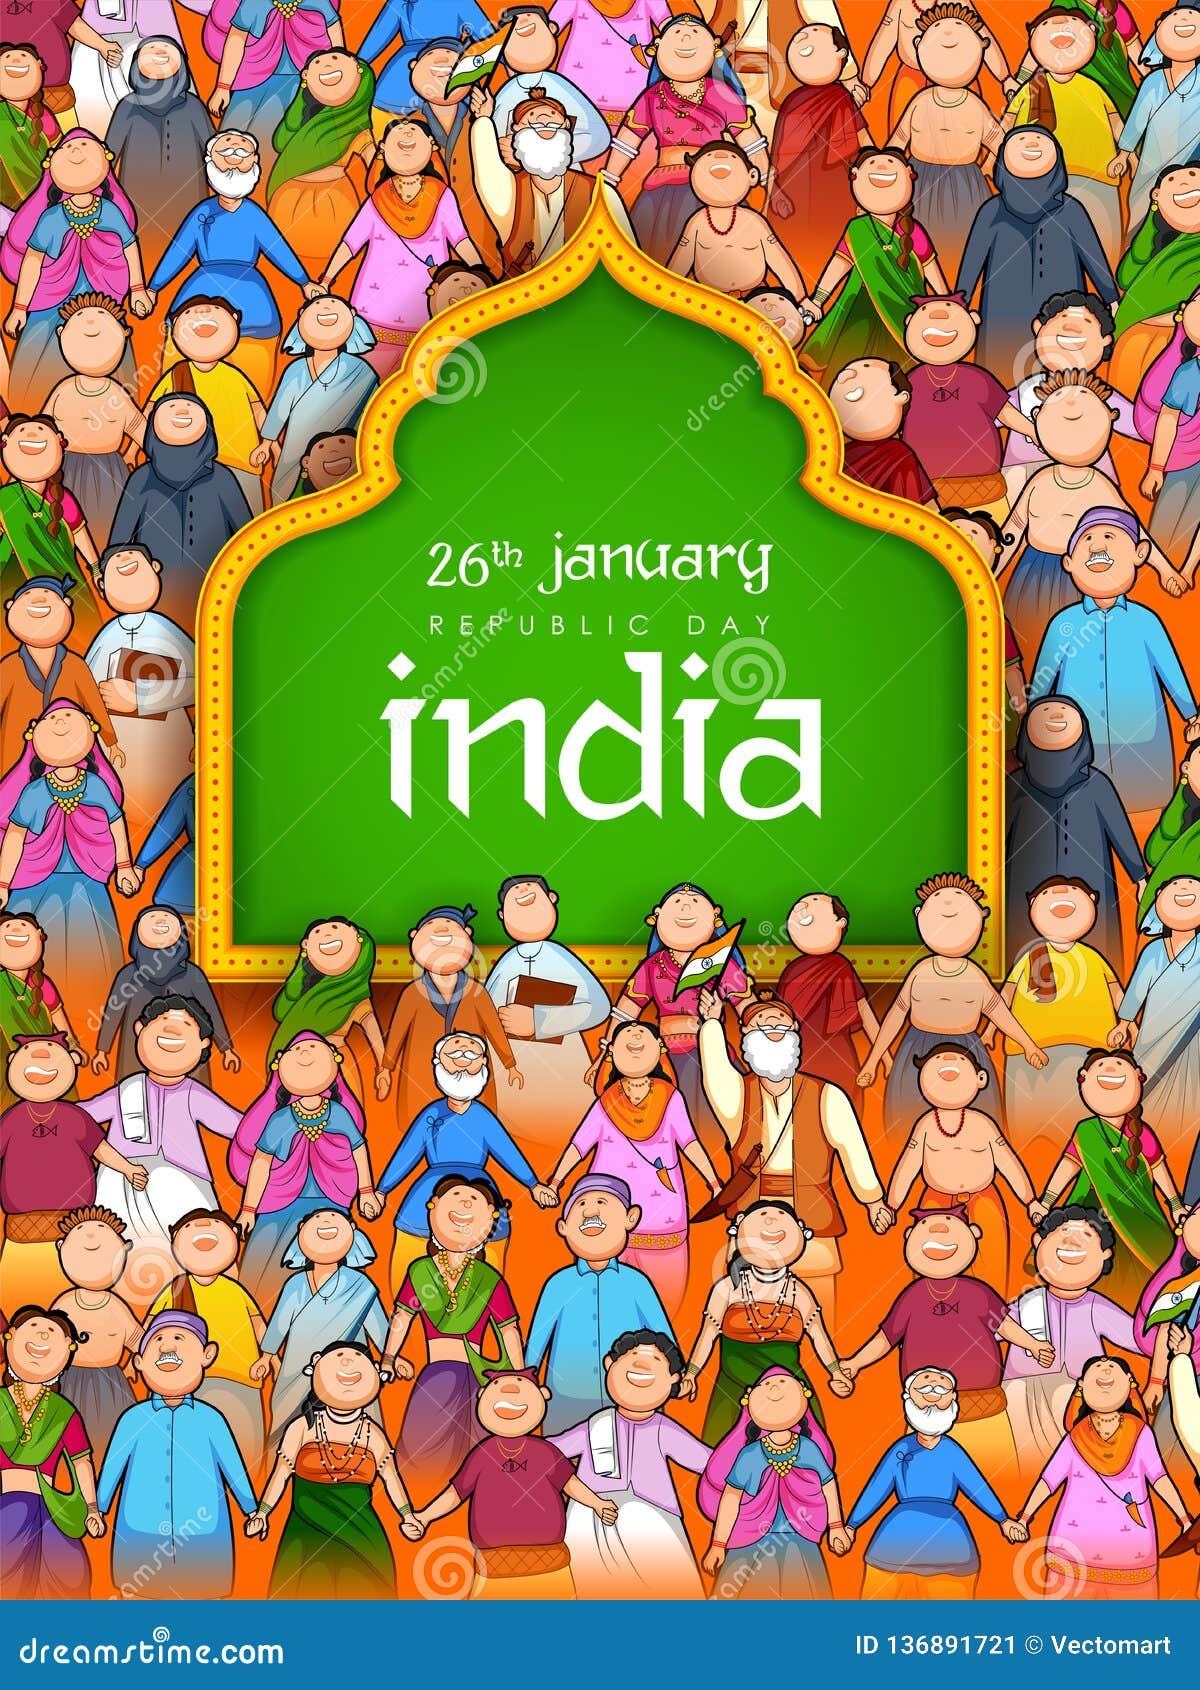 Hindu Muslim Unity Stock Illustrations 169 Hindu Muslim Unity Stock Illustrations Vectors Clipart Dreamstime Happy republic day images 2021 muslim